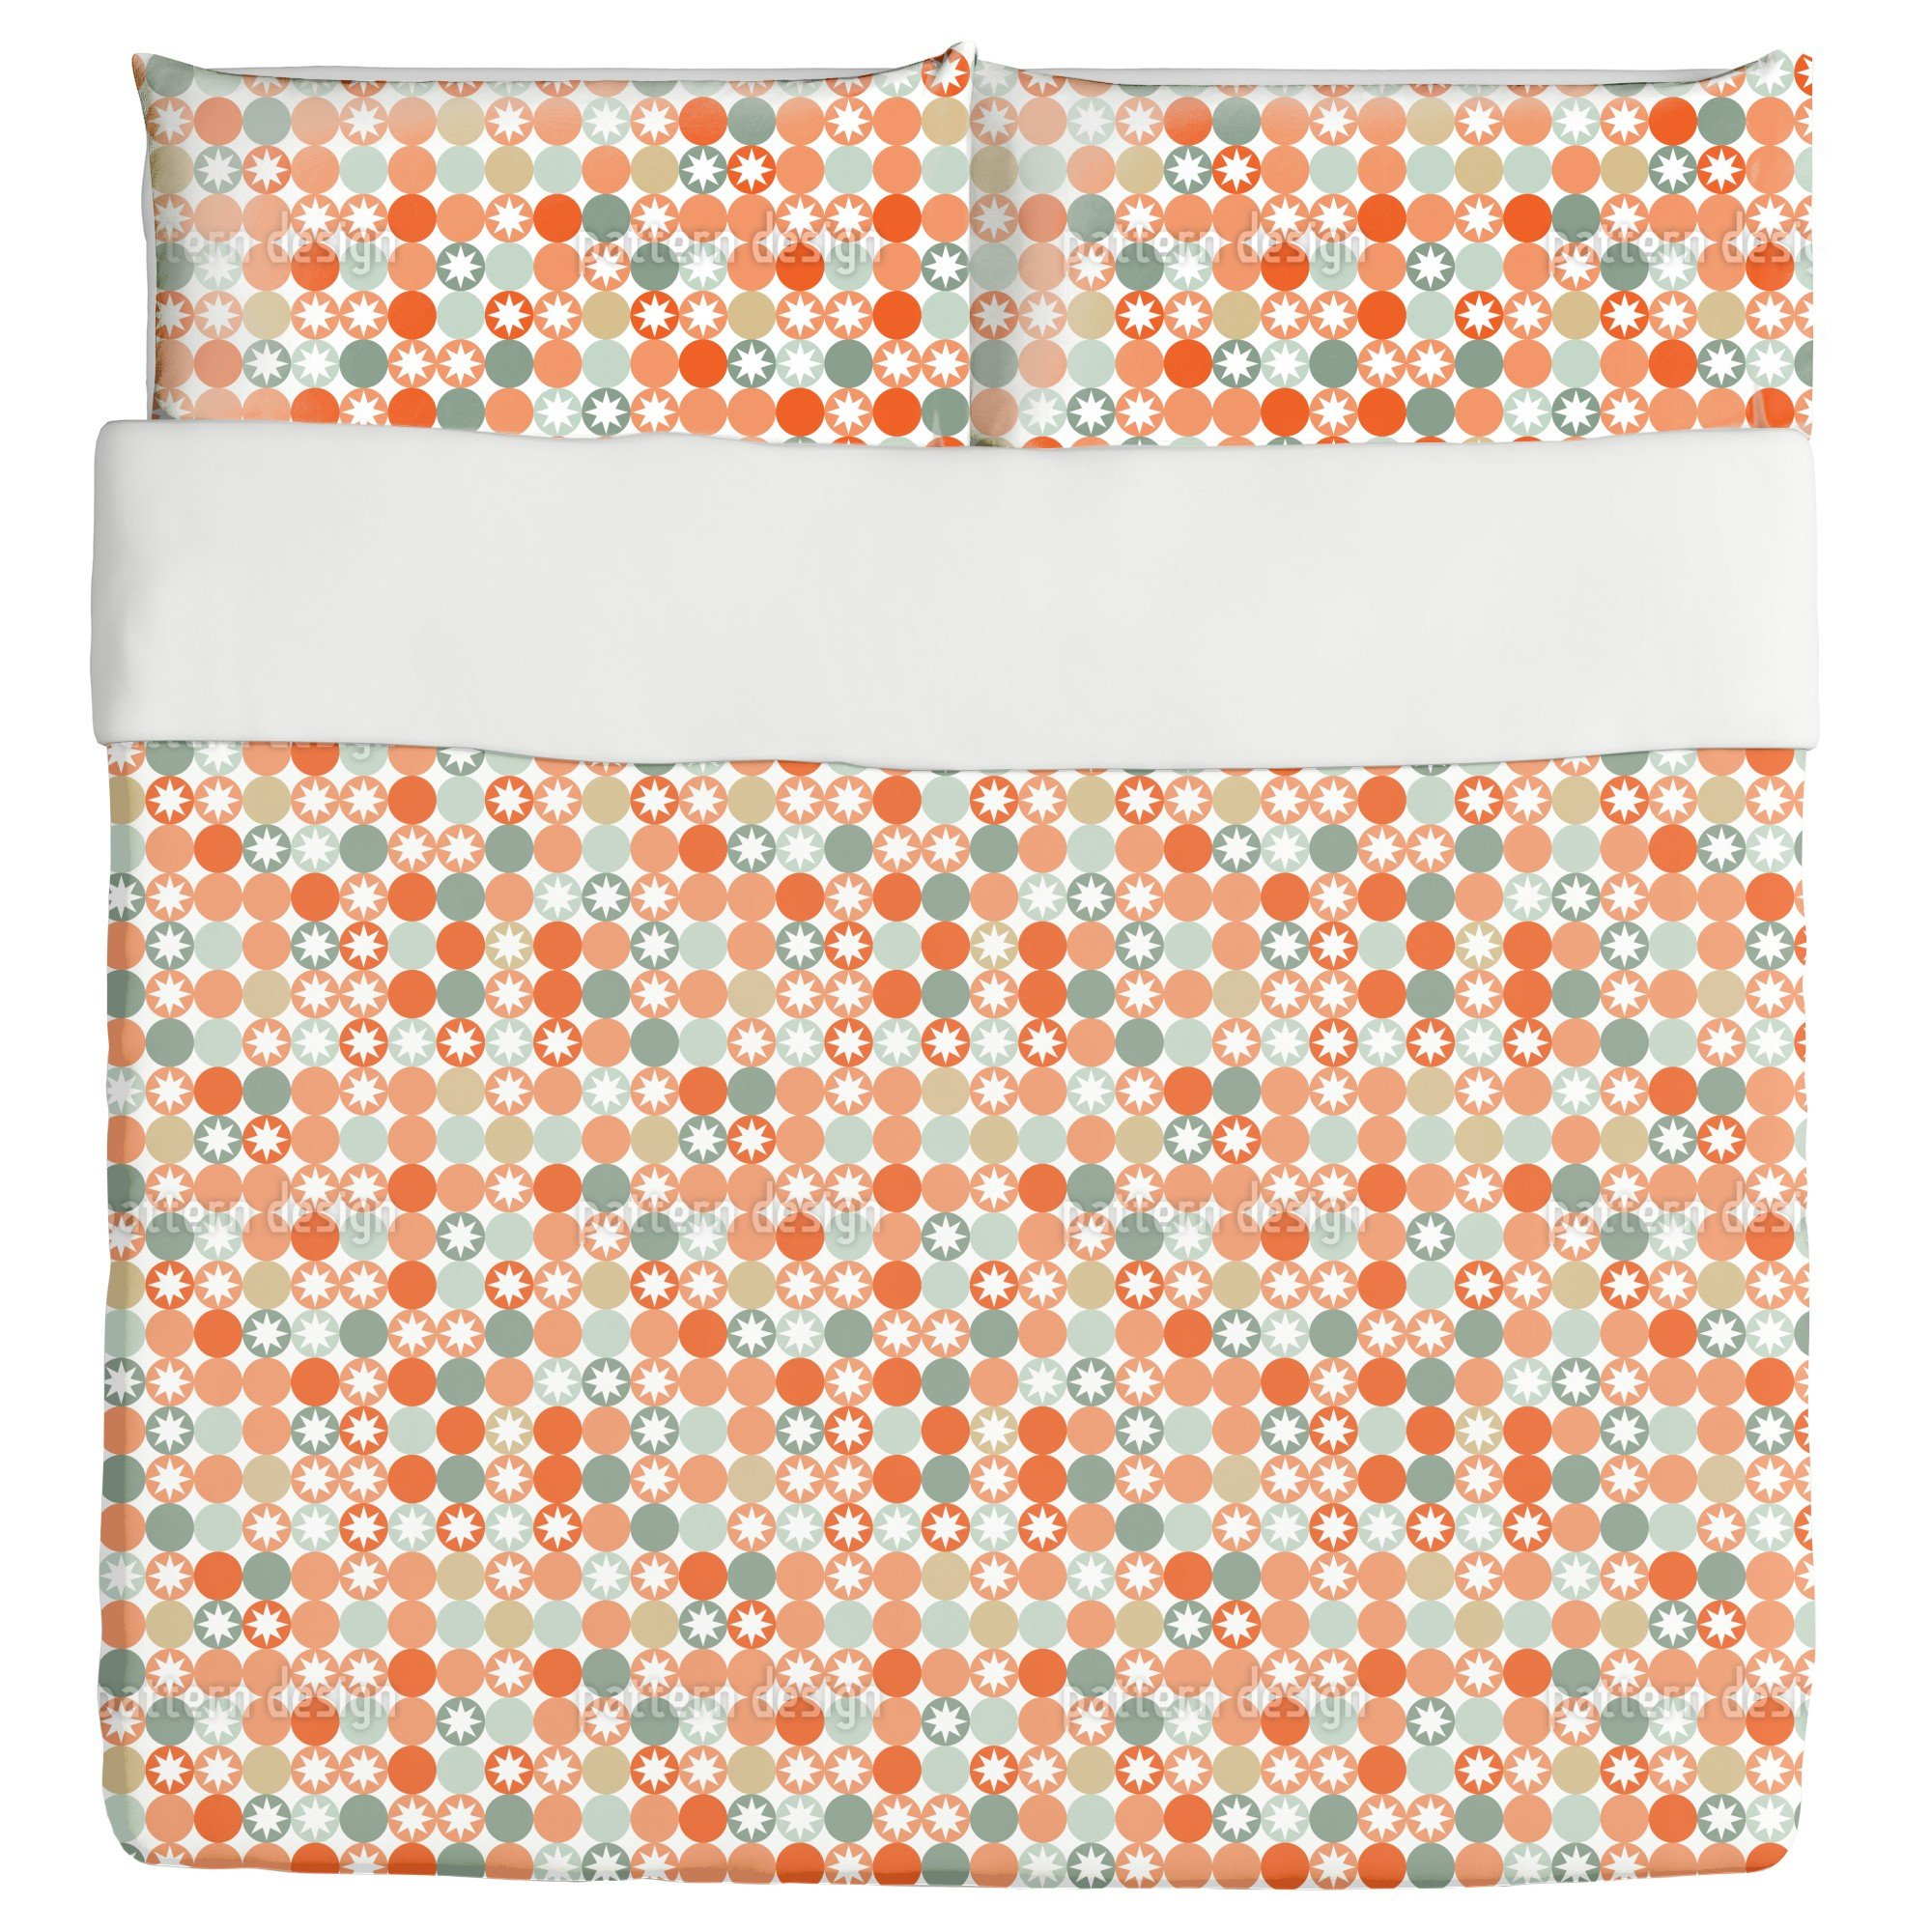 Autumnal Star Bingo Duvet Bed Set 3 Piece Set Duvet Cover - 2 Pillow Shams - Luxury Microfiber, Soft, Breathable by uneekee